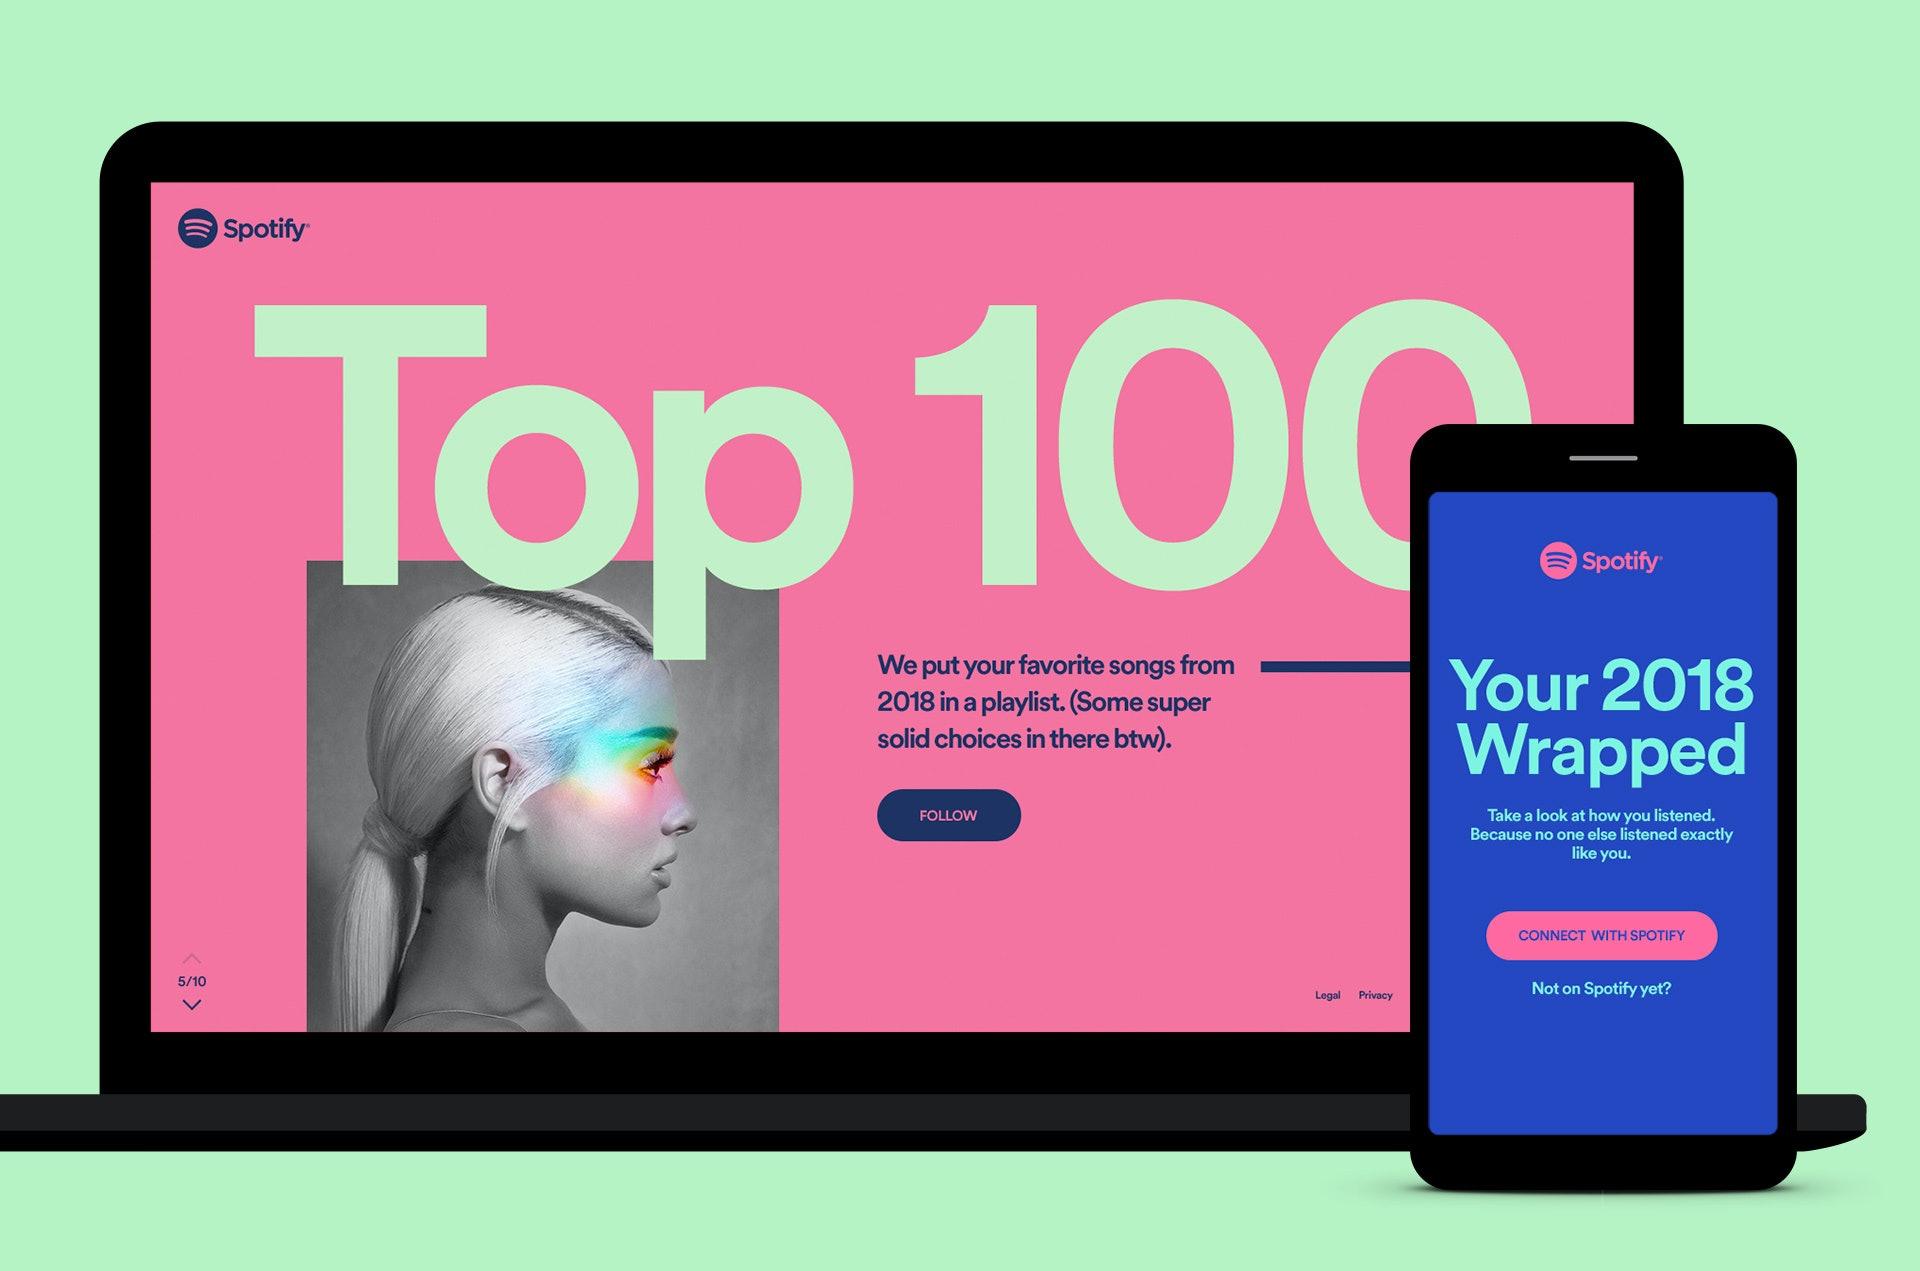 spotify wrapped 2019 com